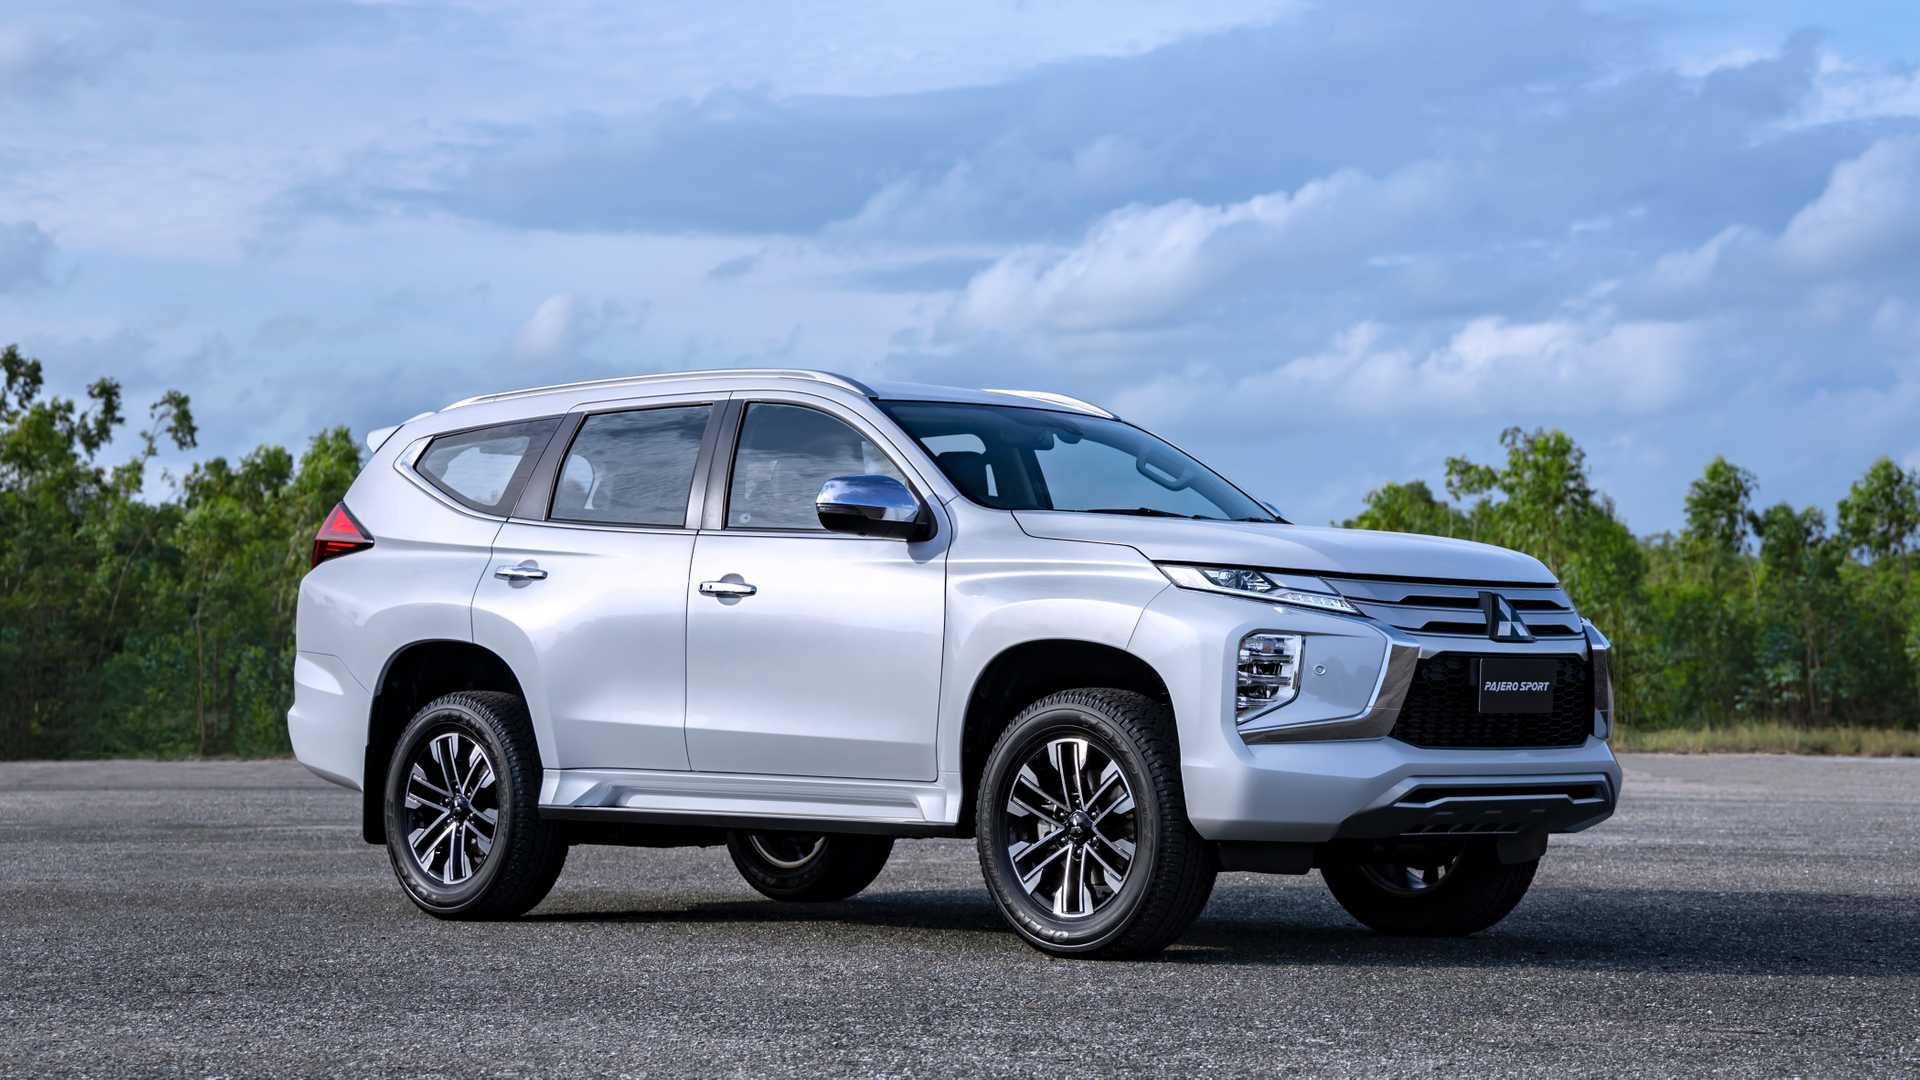 2020 Mitsubishi Pajero Redesign And Us Release Date >> 2020 Mitsubishi Pajero Sport Gets Fresh Face Updated Interior